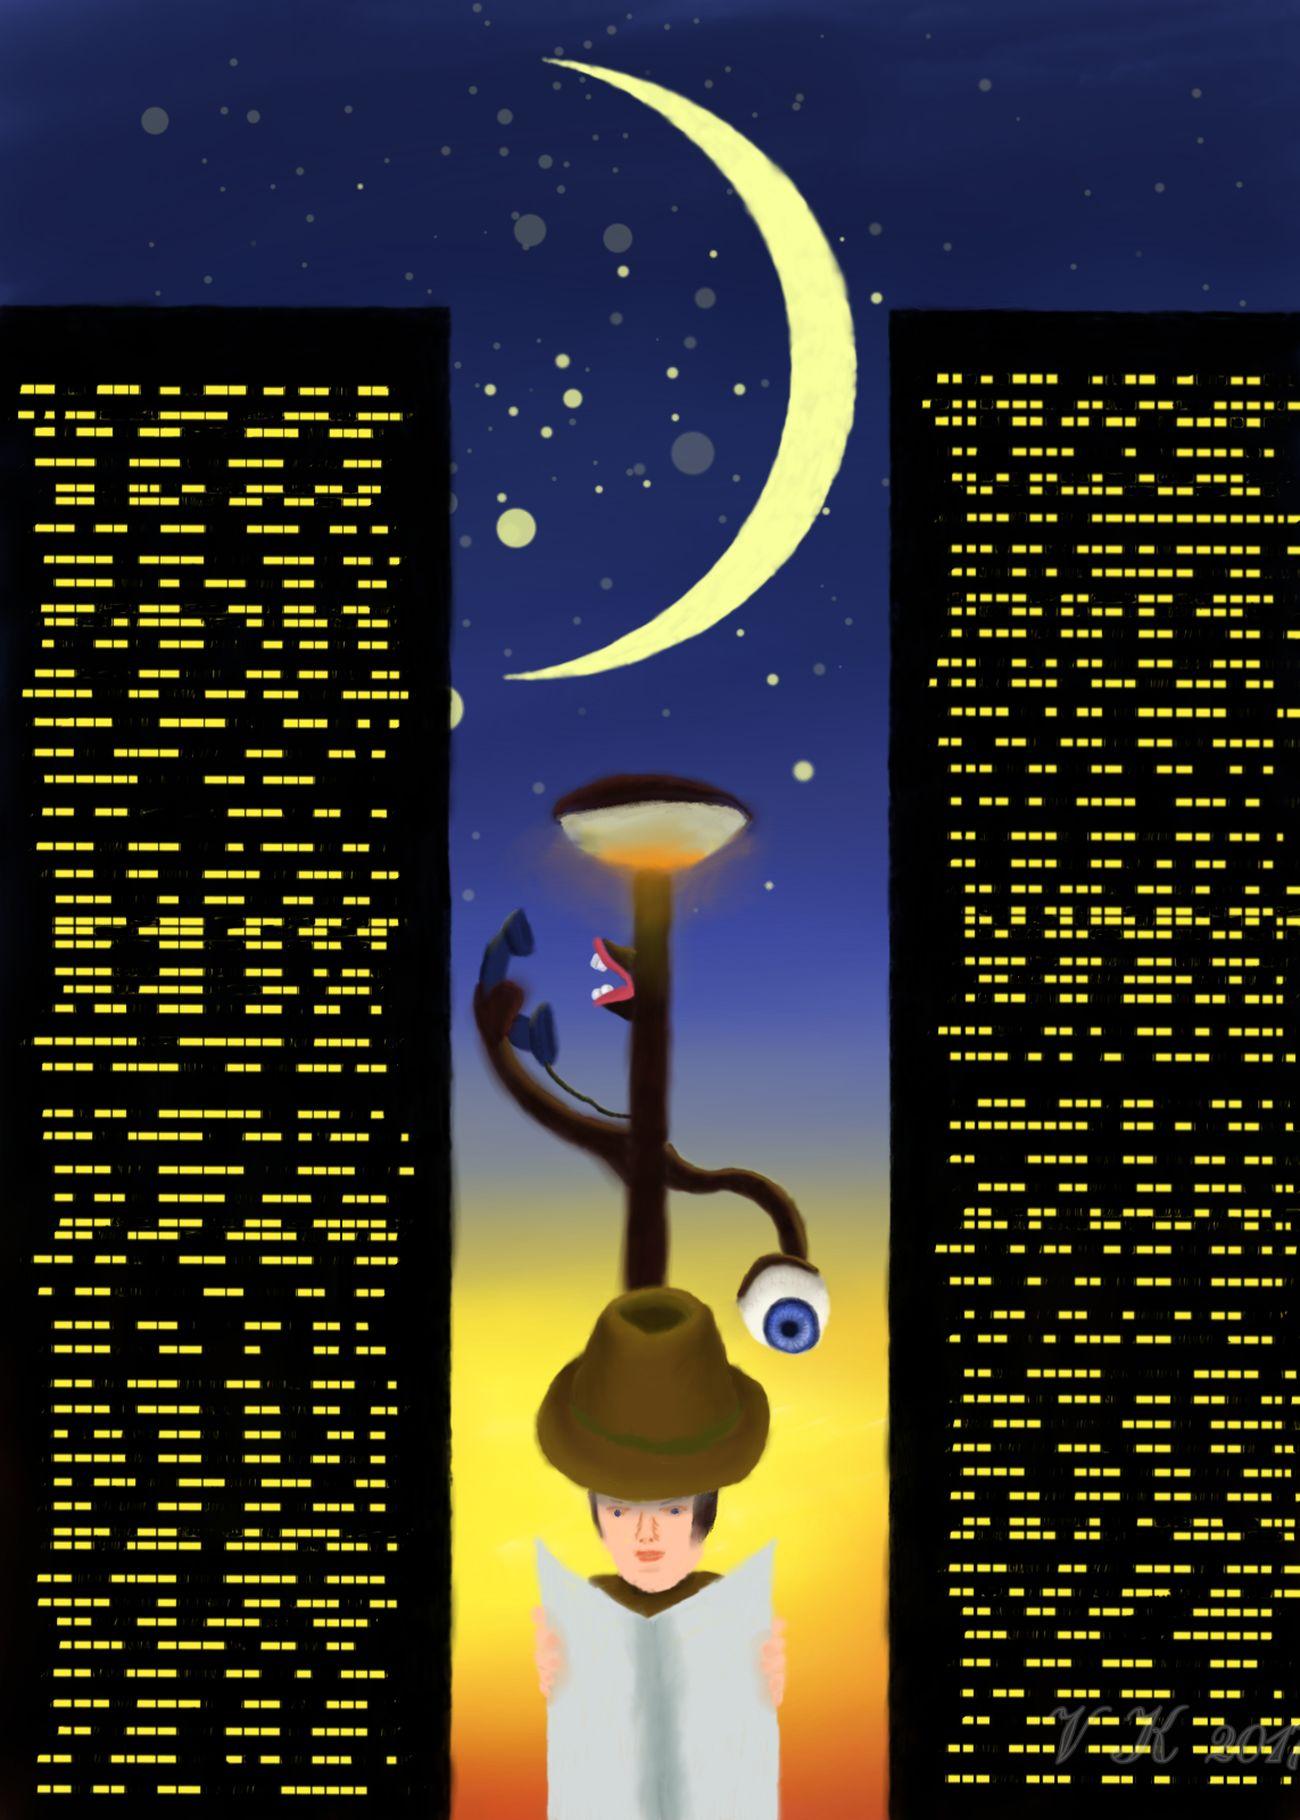 Under observation - my new digital painting Moon Skyscraper Sky MYArtwork❤ MyArt Surrealism Digital Painting Digital Art